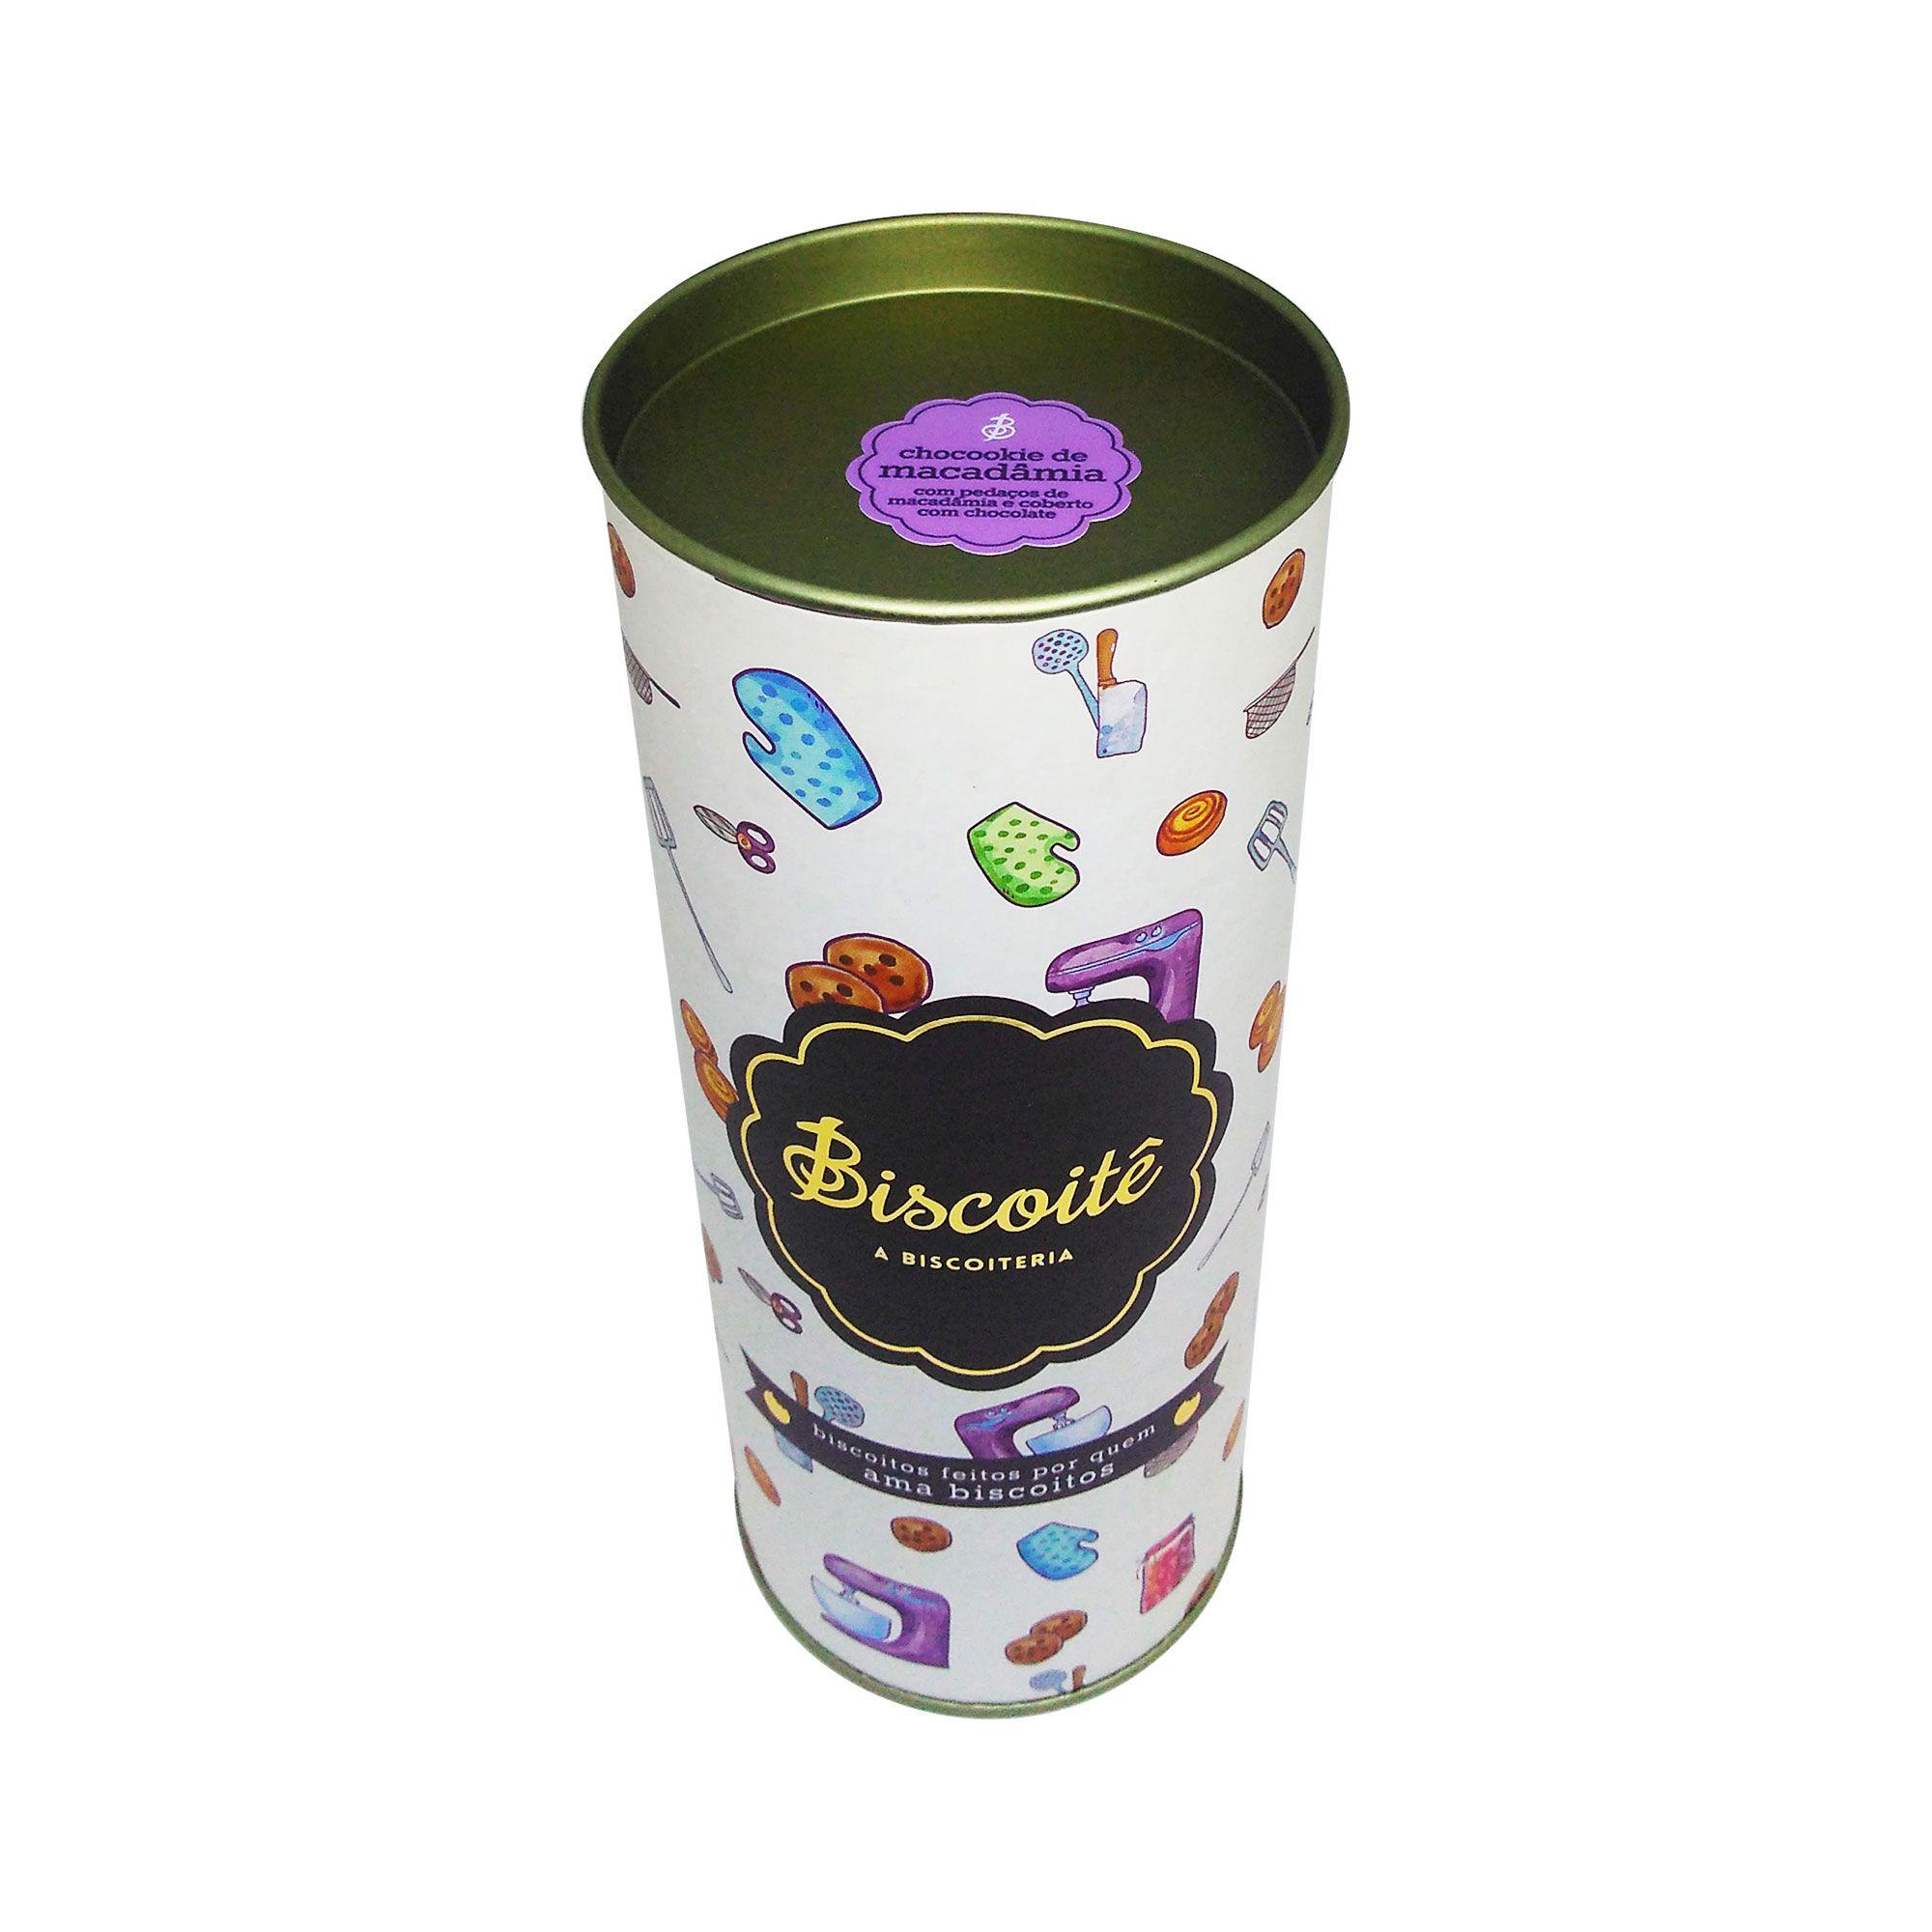 Bombom de Cookie de Macadâmia - LATA - 140G